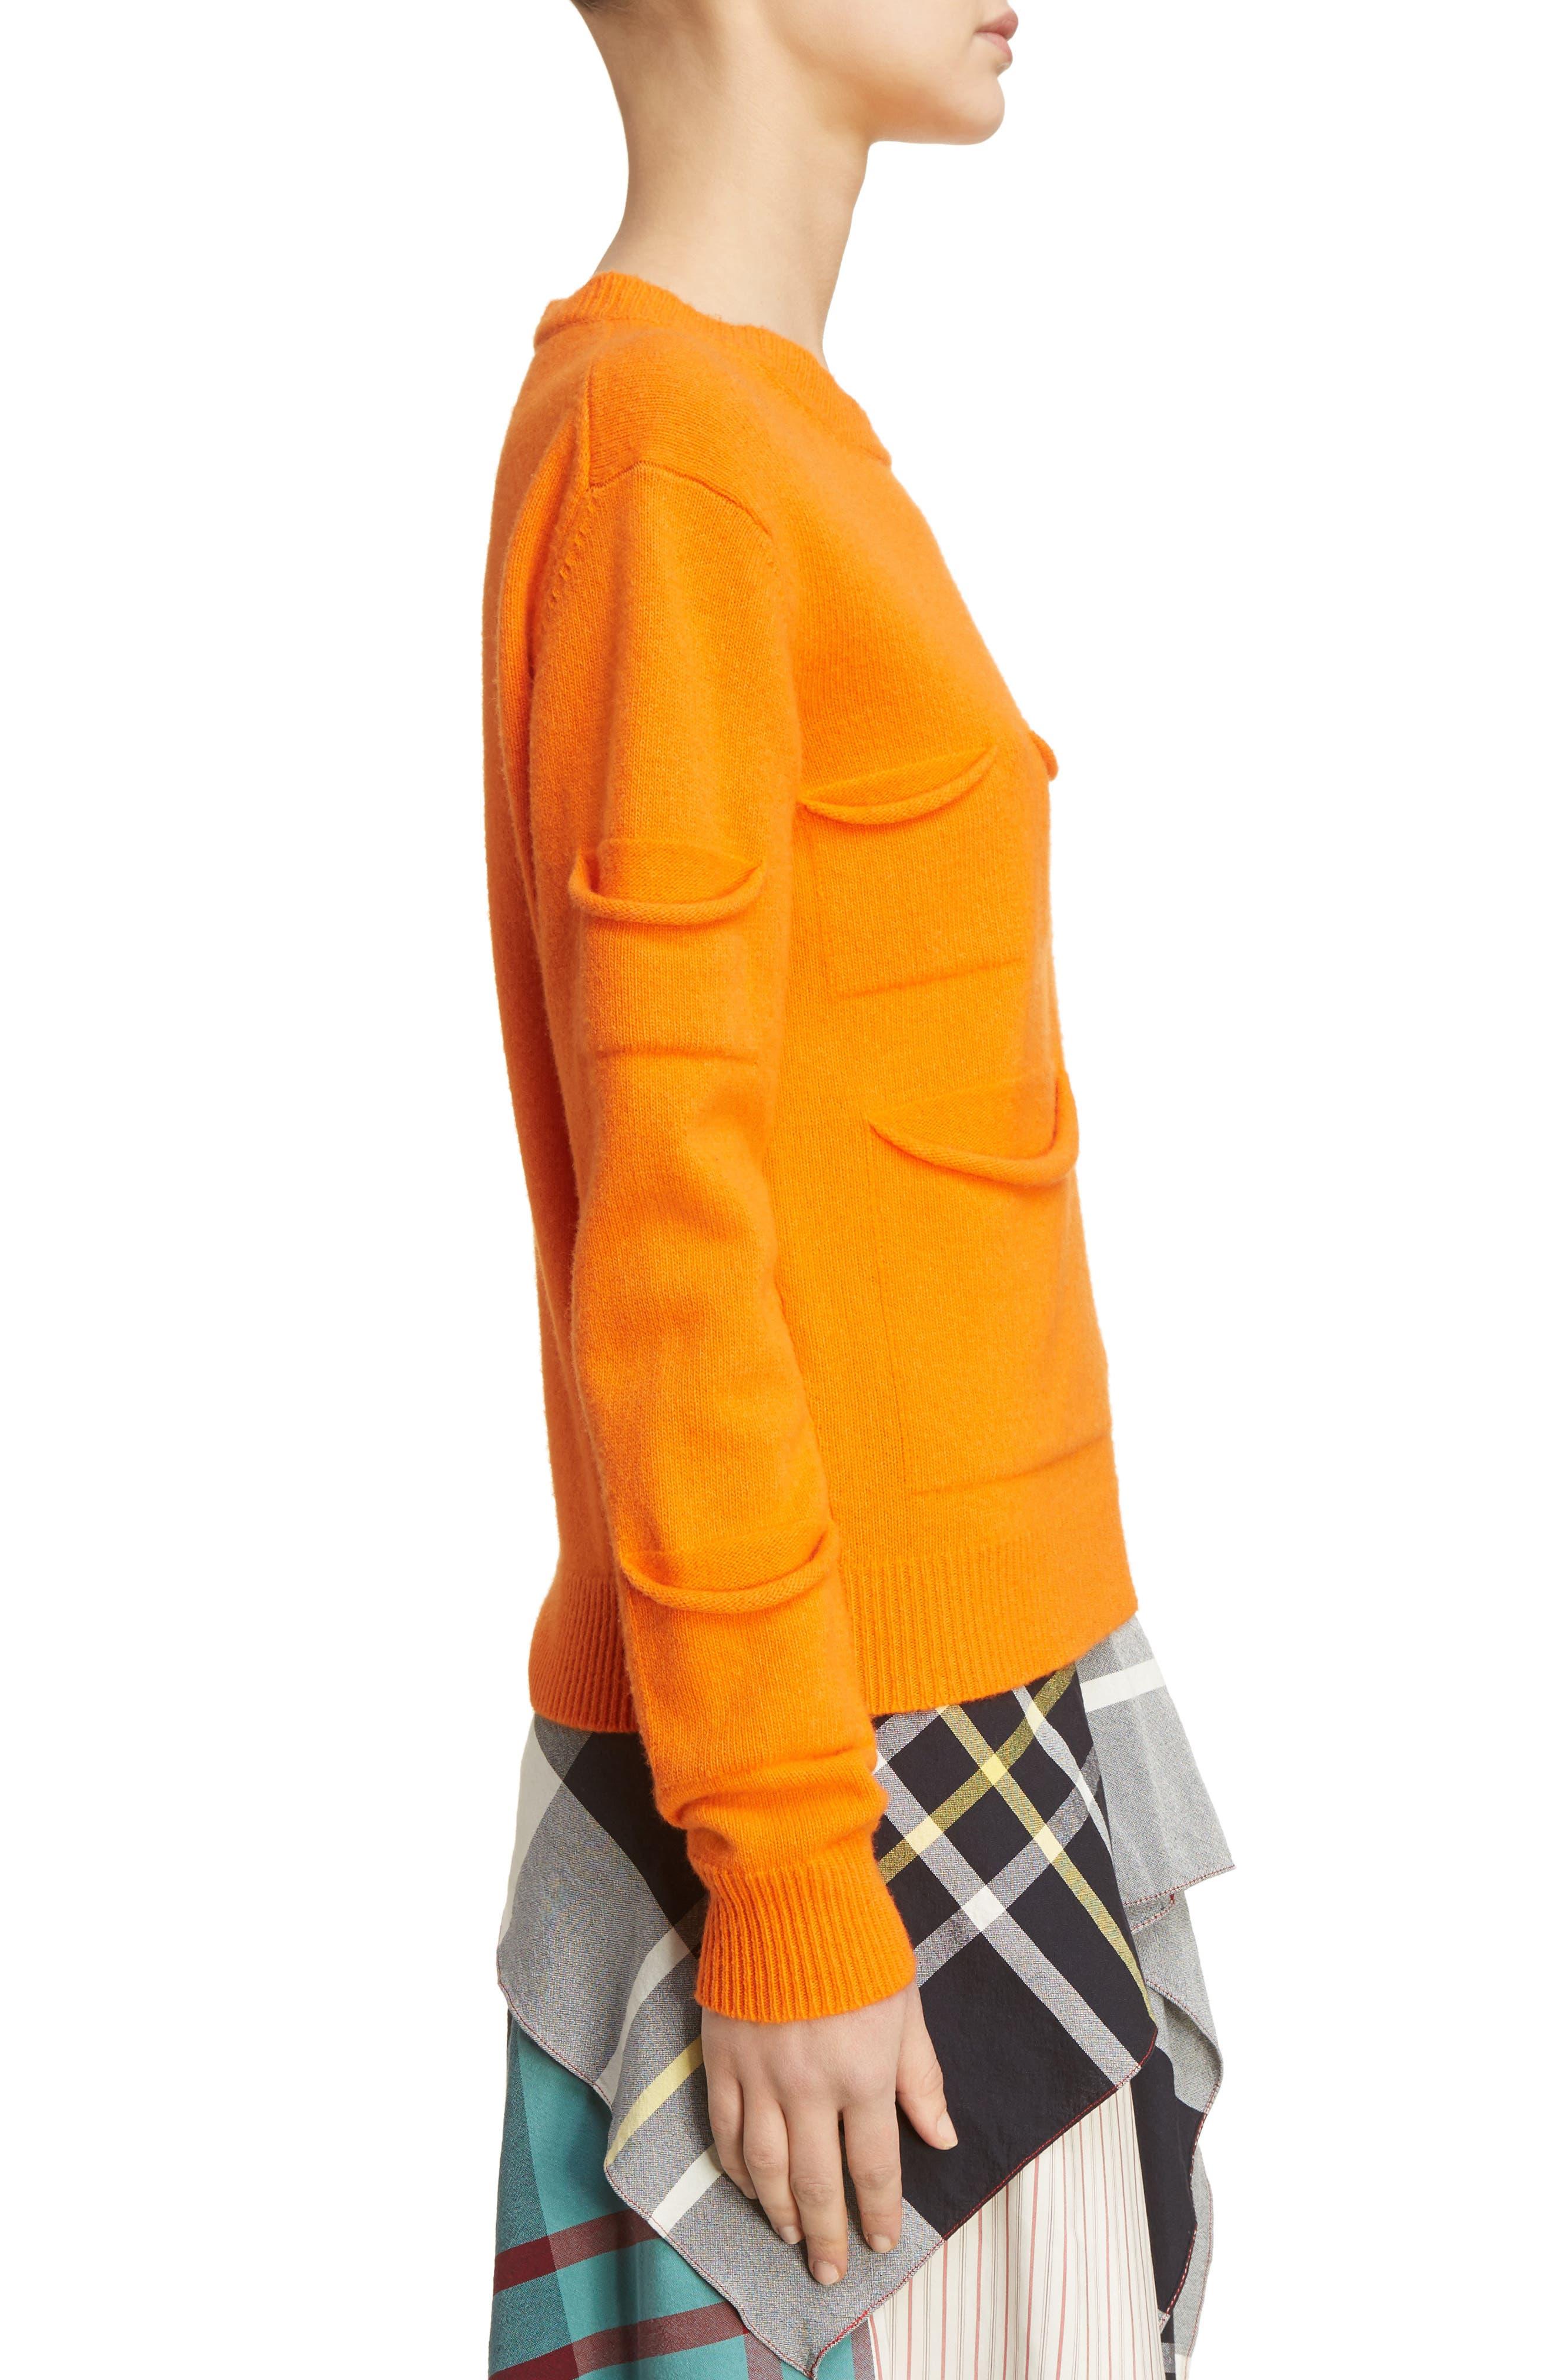 J.W.ANDERSON Multi Pocket Crewneck Sweater,                             Alternate thumbnail 4, color,                             Tangerine